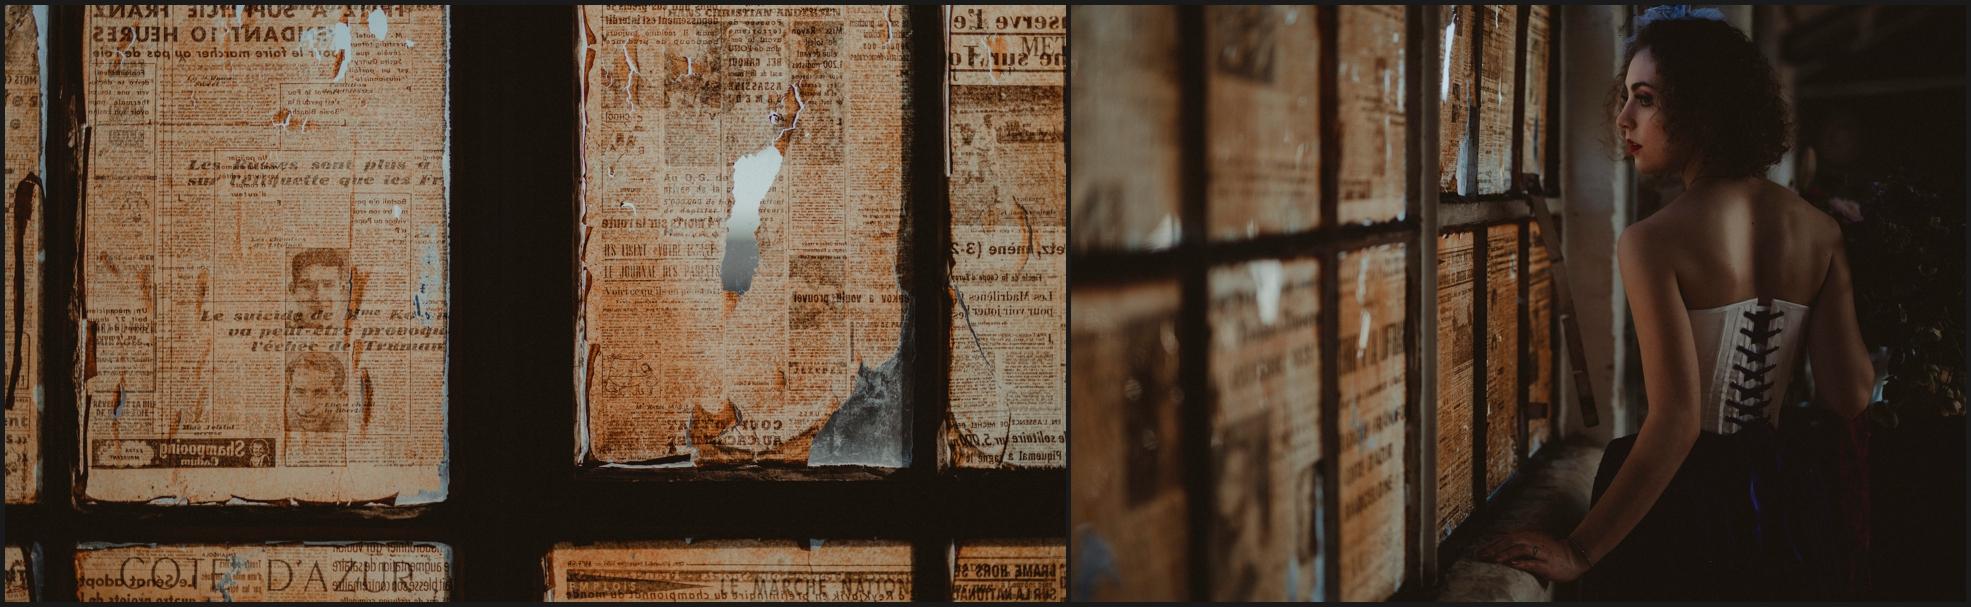 windowpane, bride, newspaper, window, steampunk, wedding, vintage, location, retrò